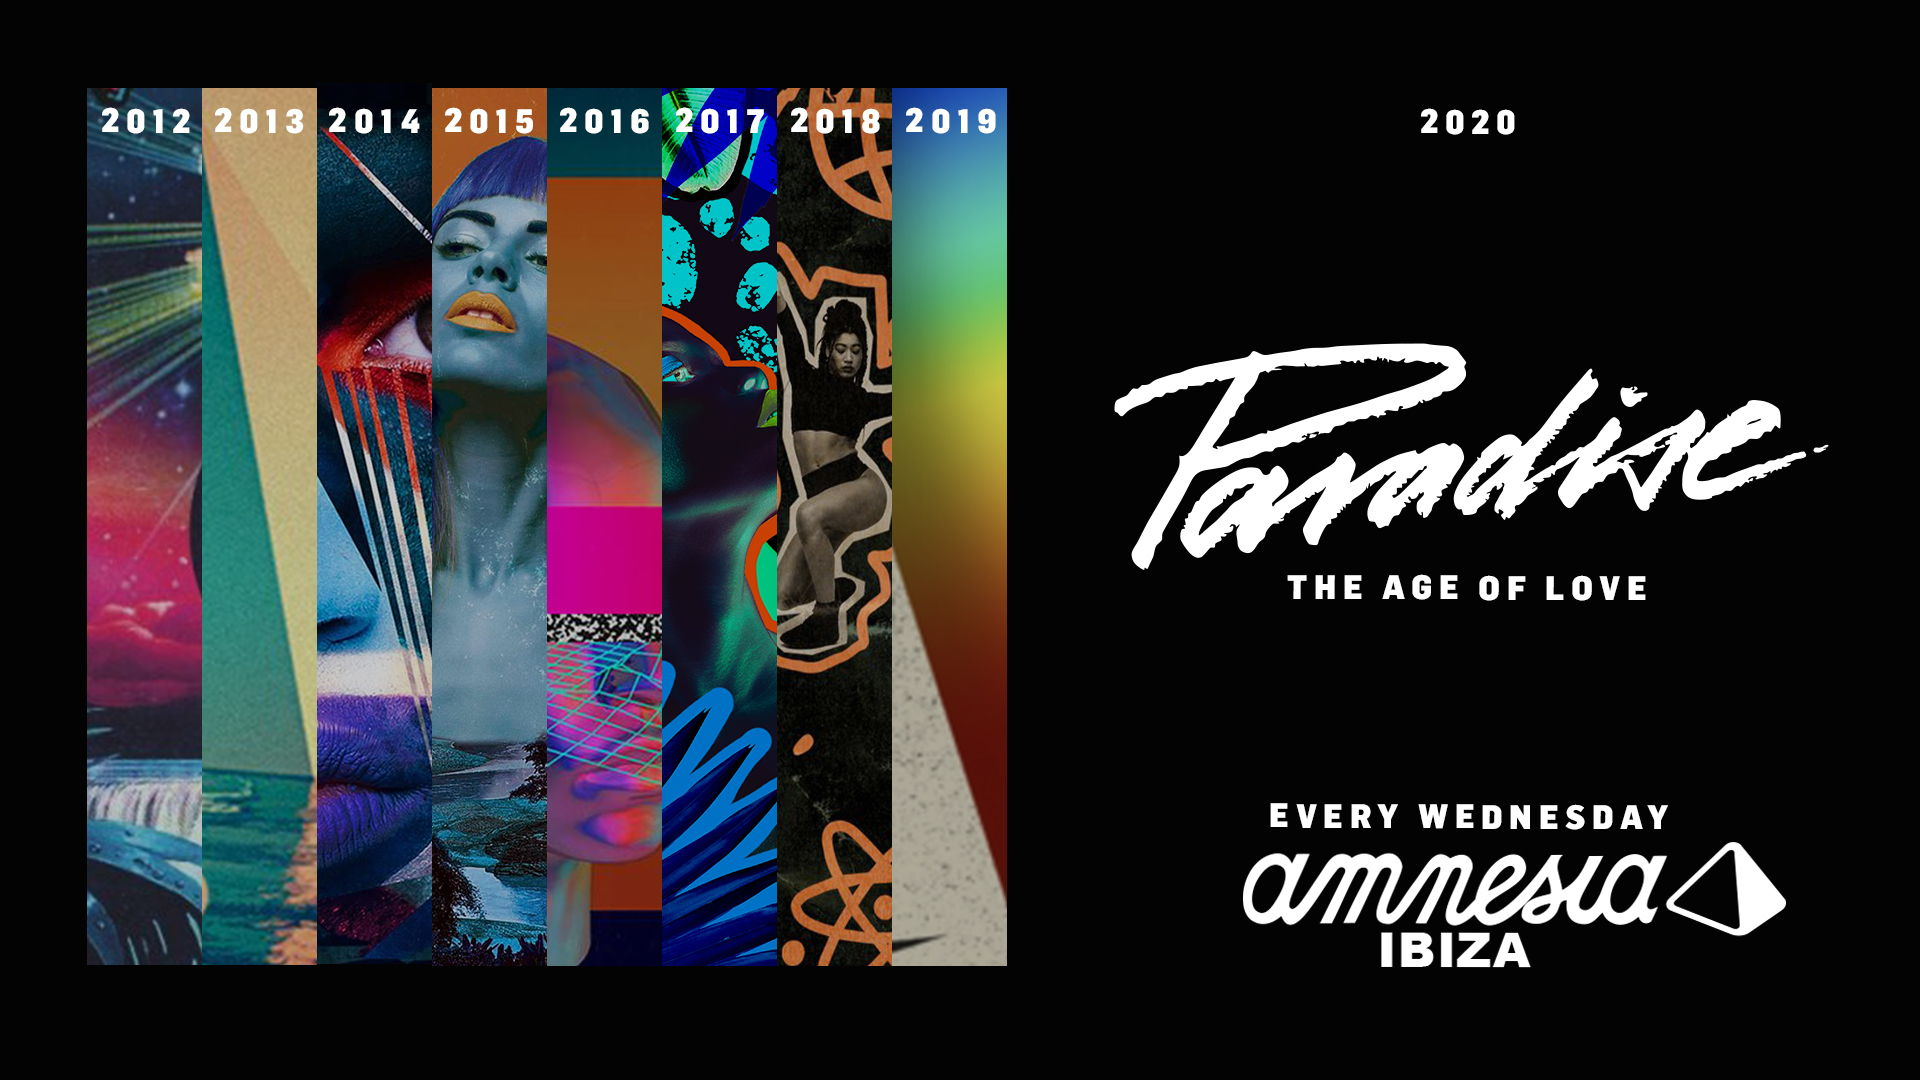 Paradise Ibiza party & Jamie Jones in Amnesia 2020